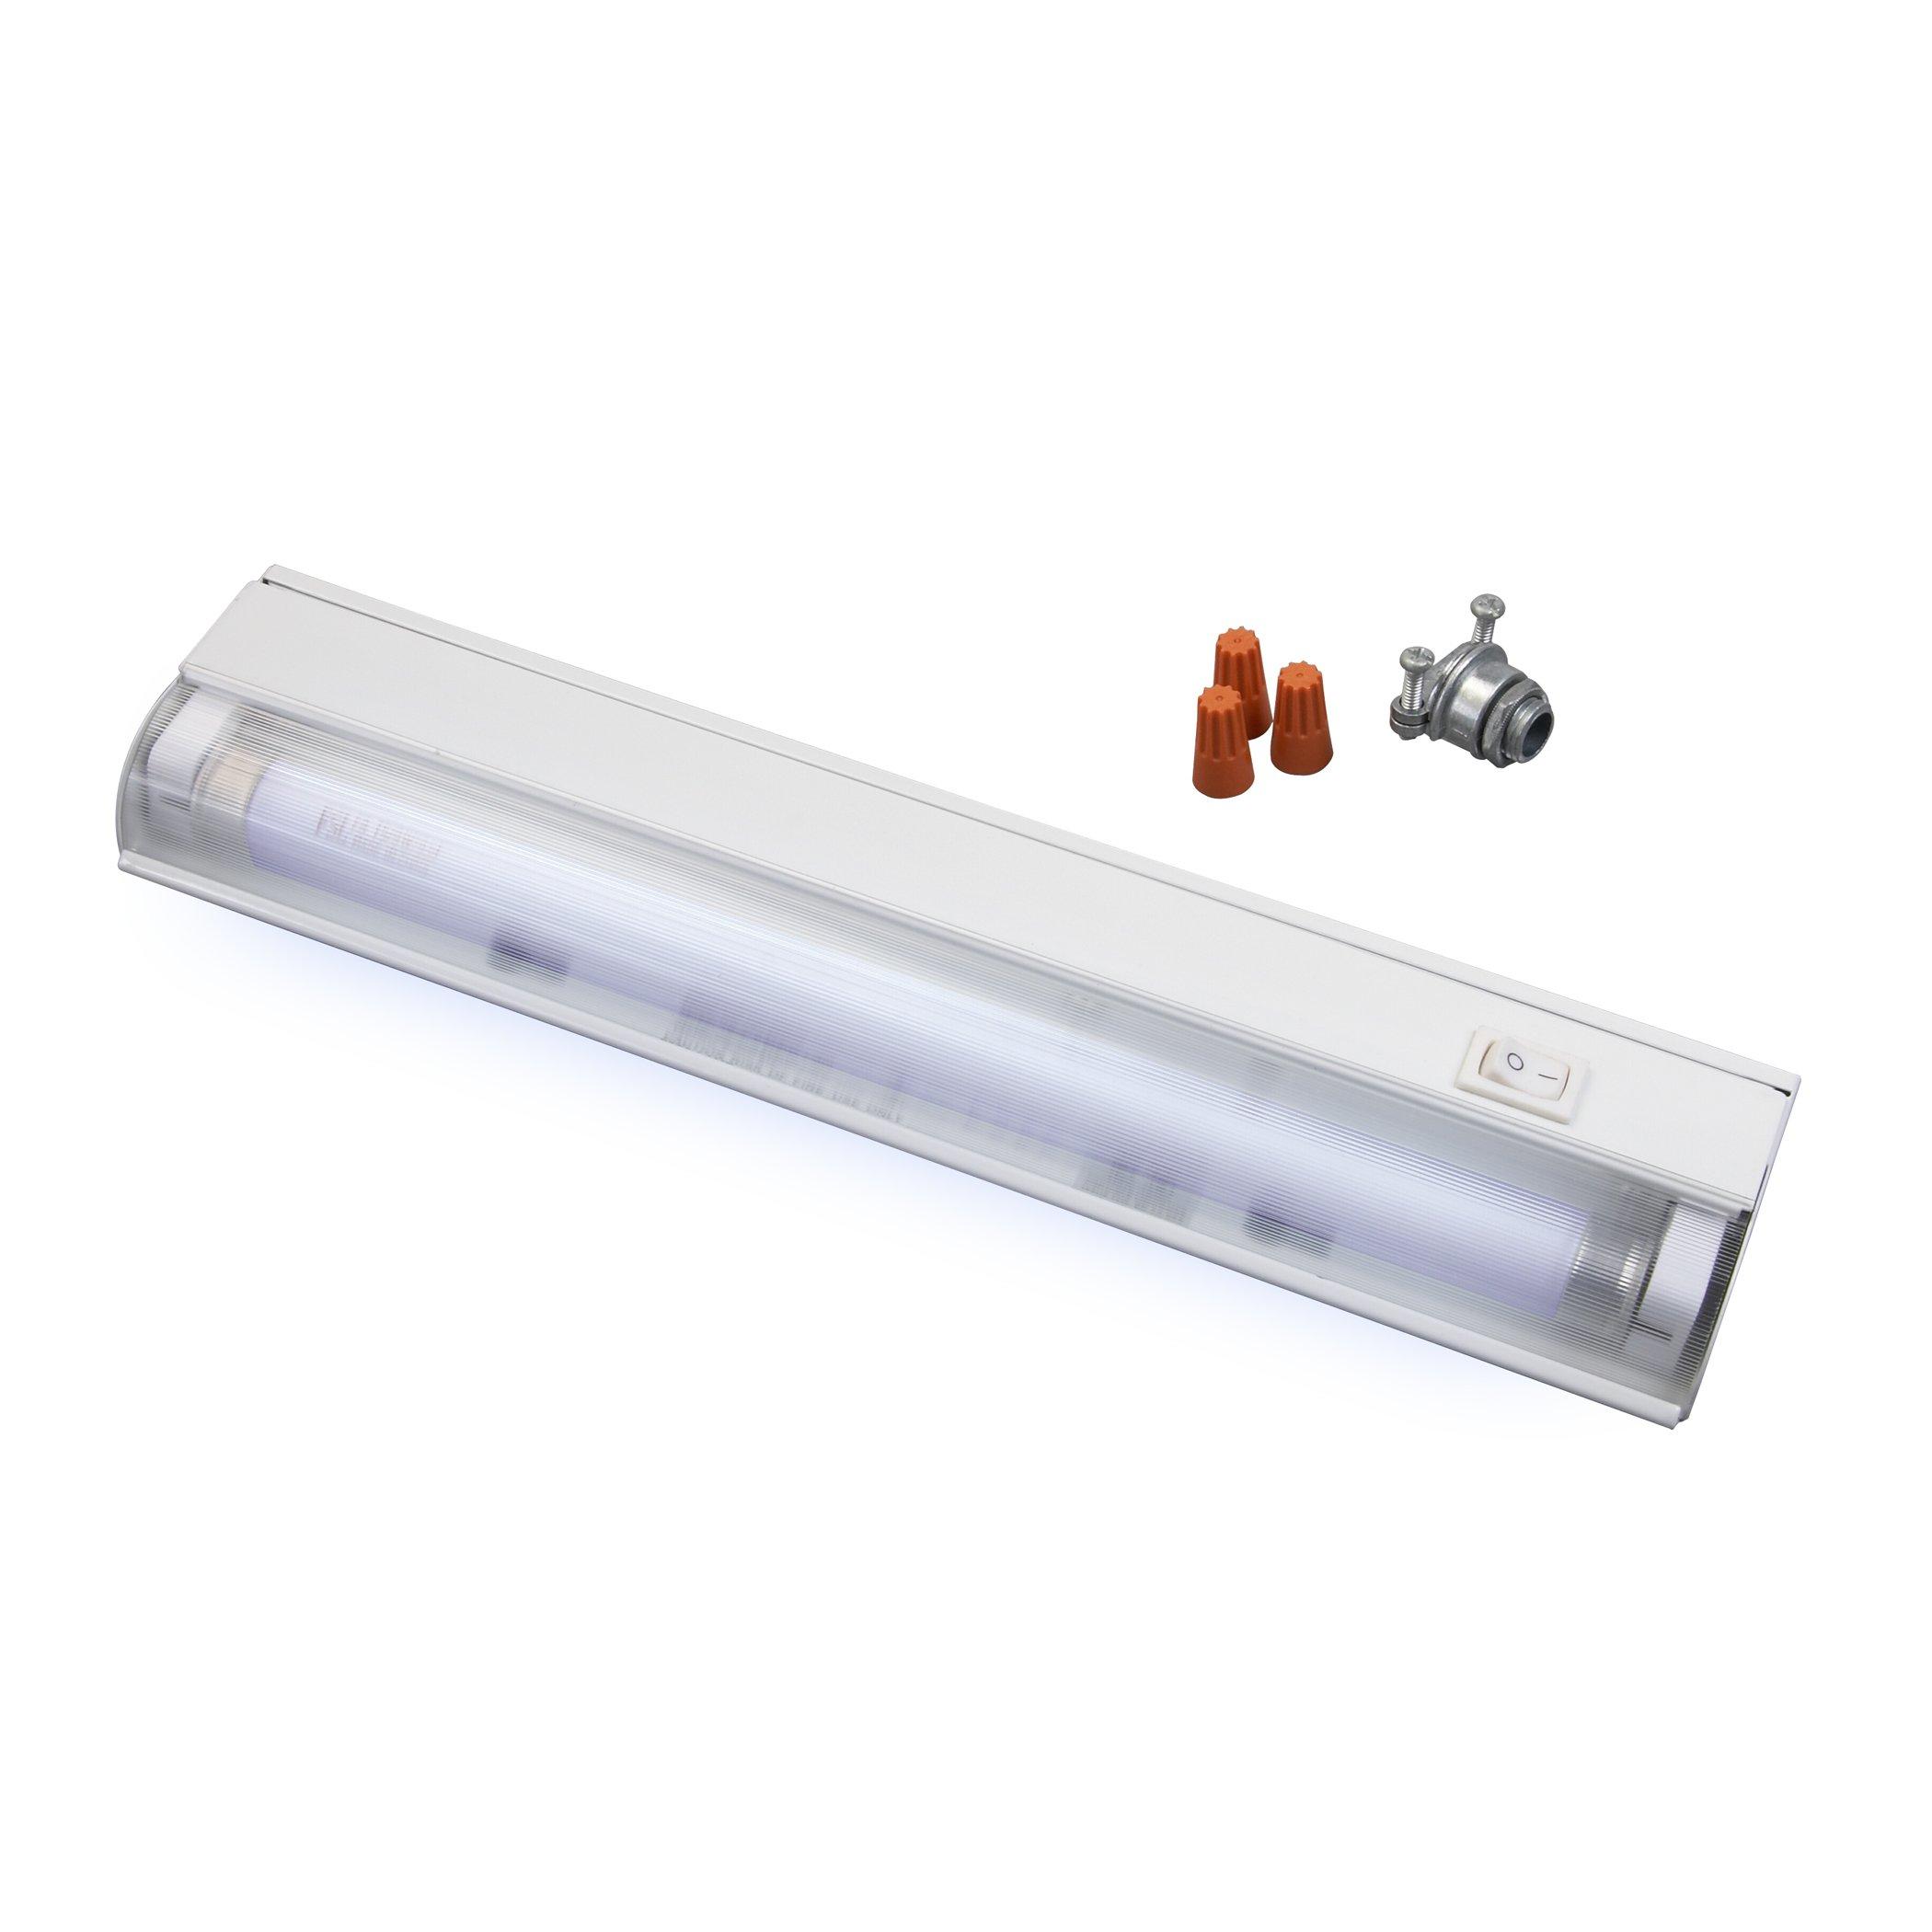 Amertac FA413HW 12.5-Inch Wire-In 8-Watt Fluorescent Slim Cabinet Light